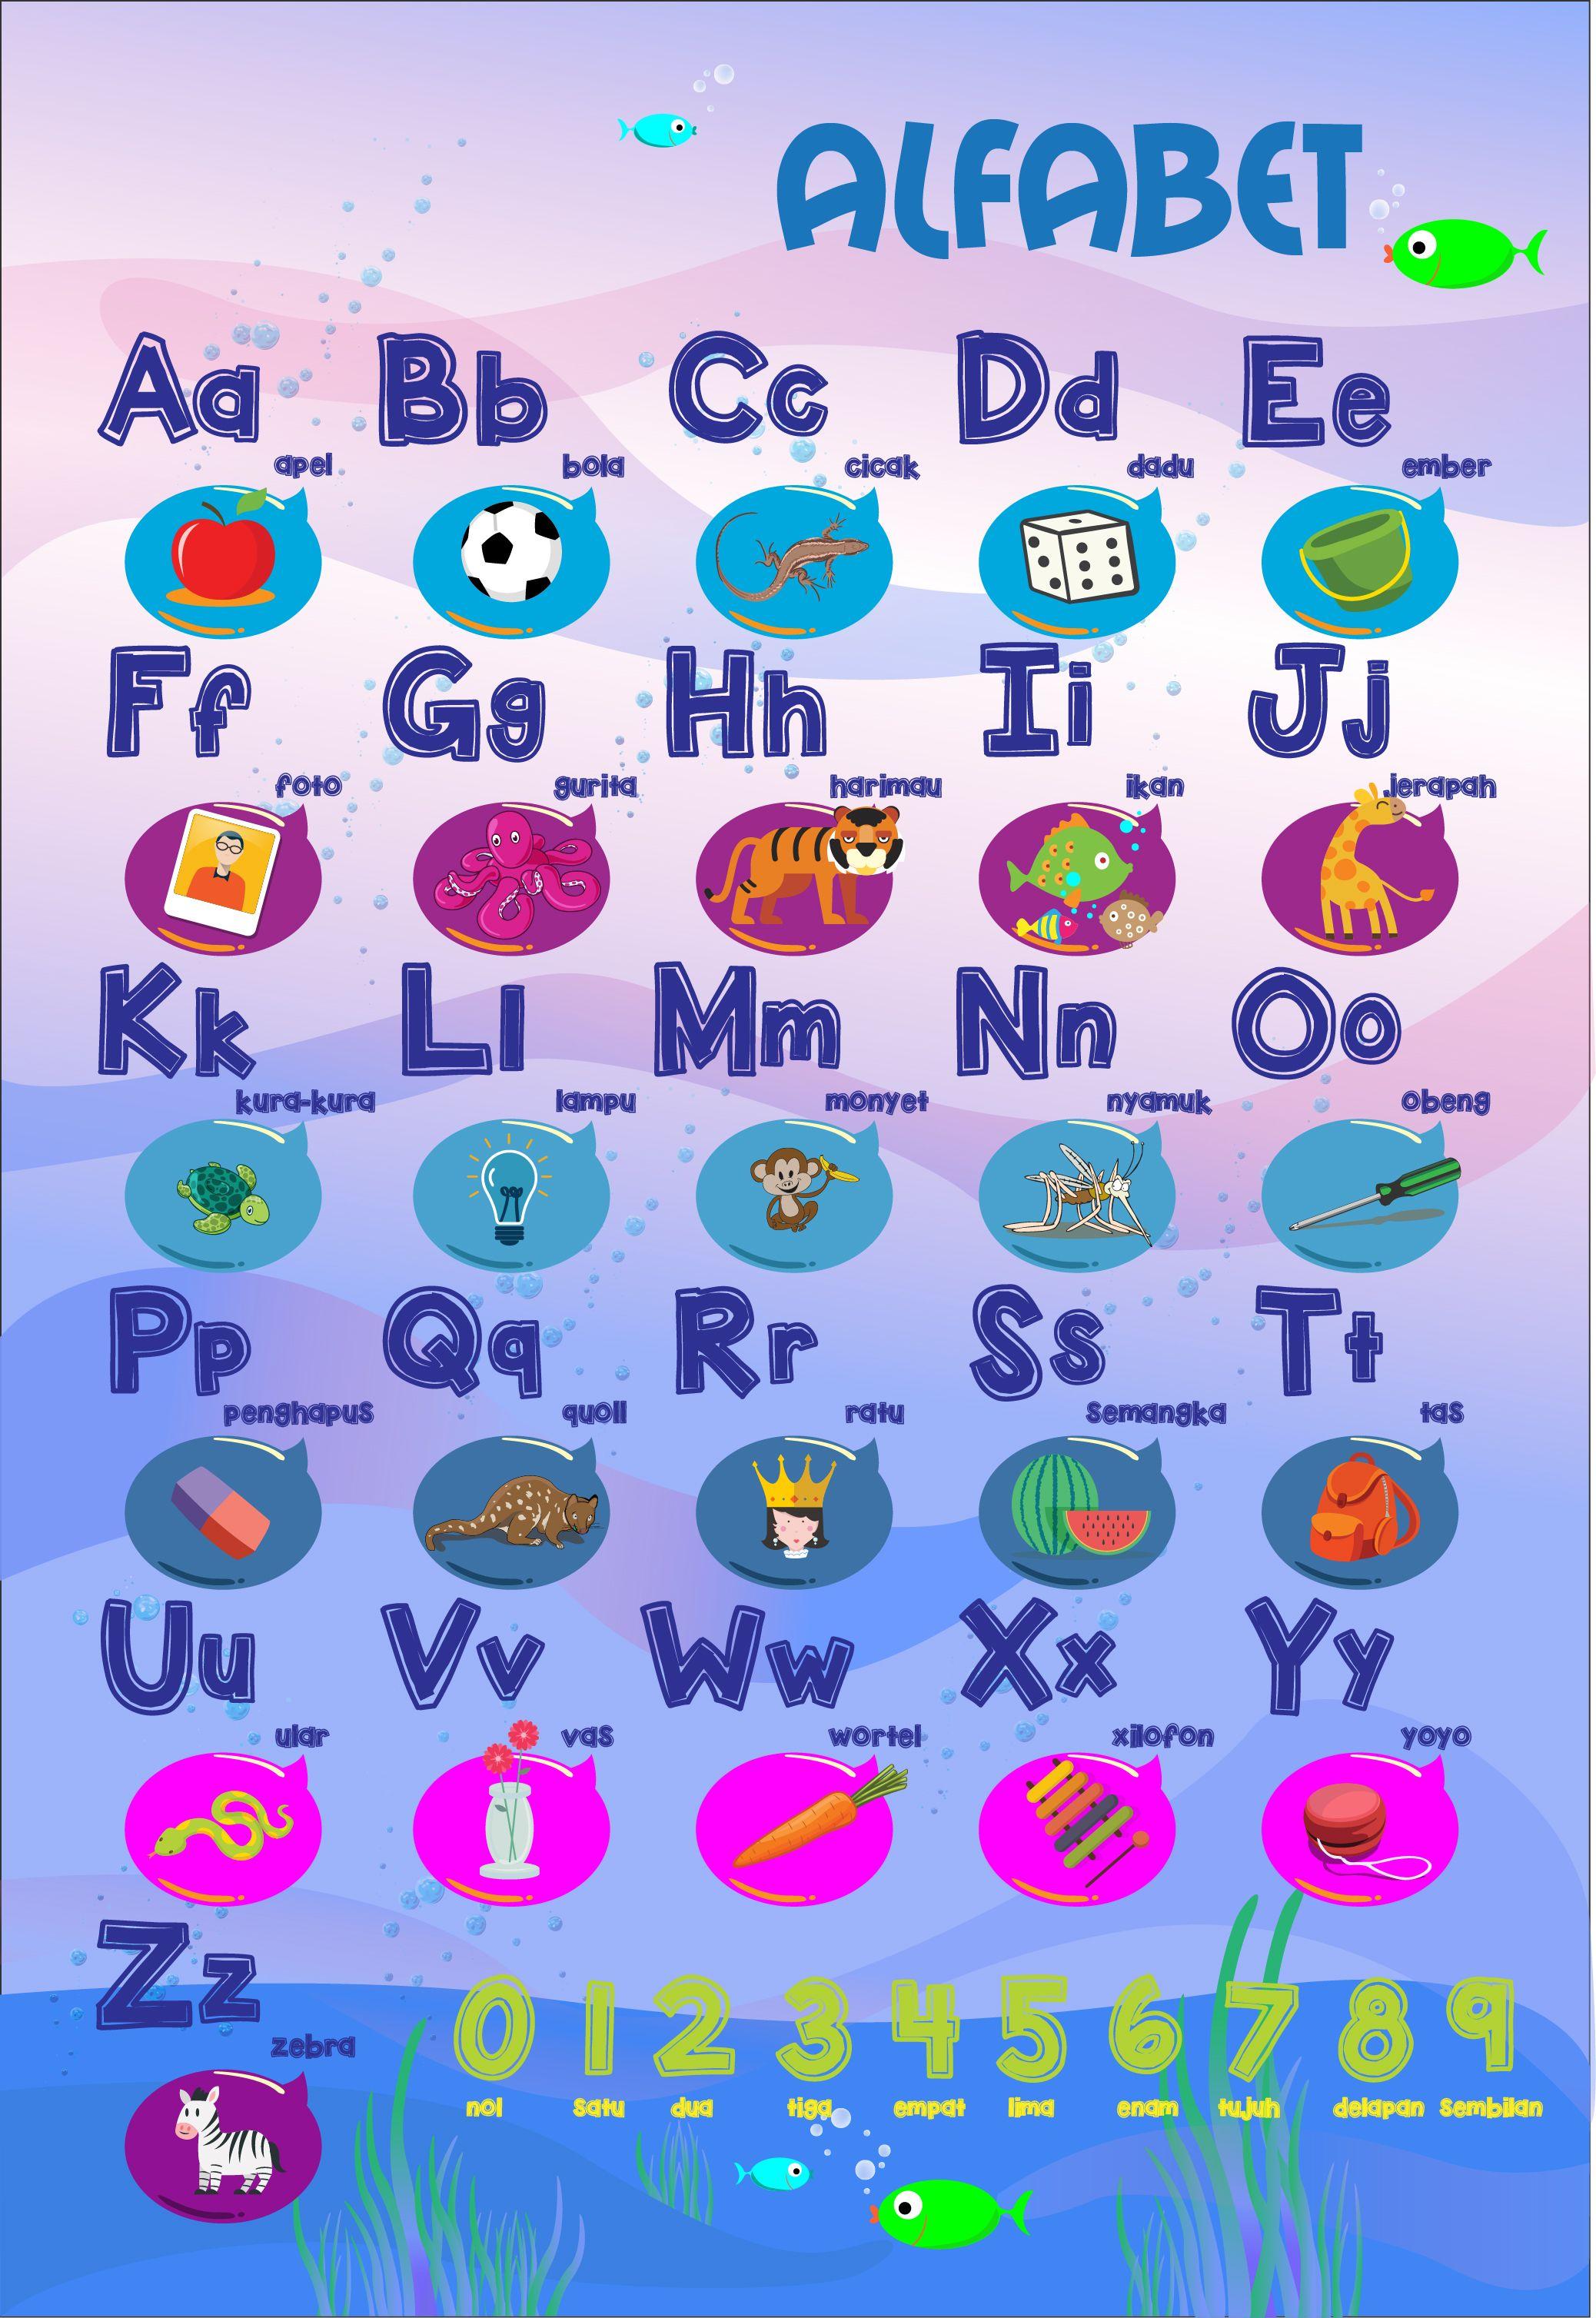 Indonesia Kids Alphabetic Poster Artwork Poster